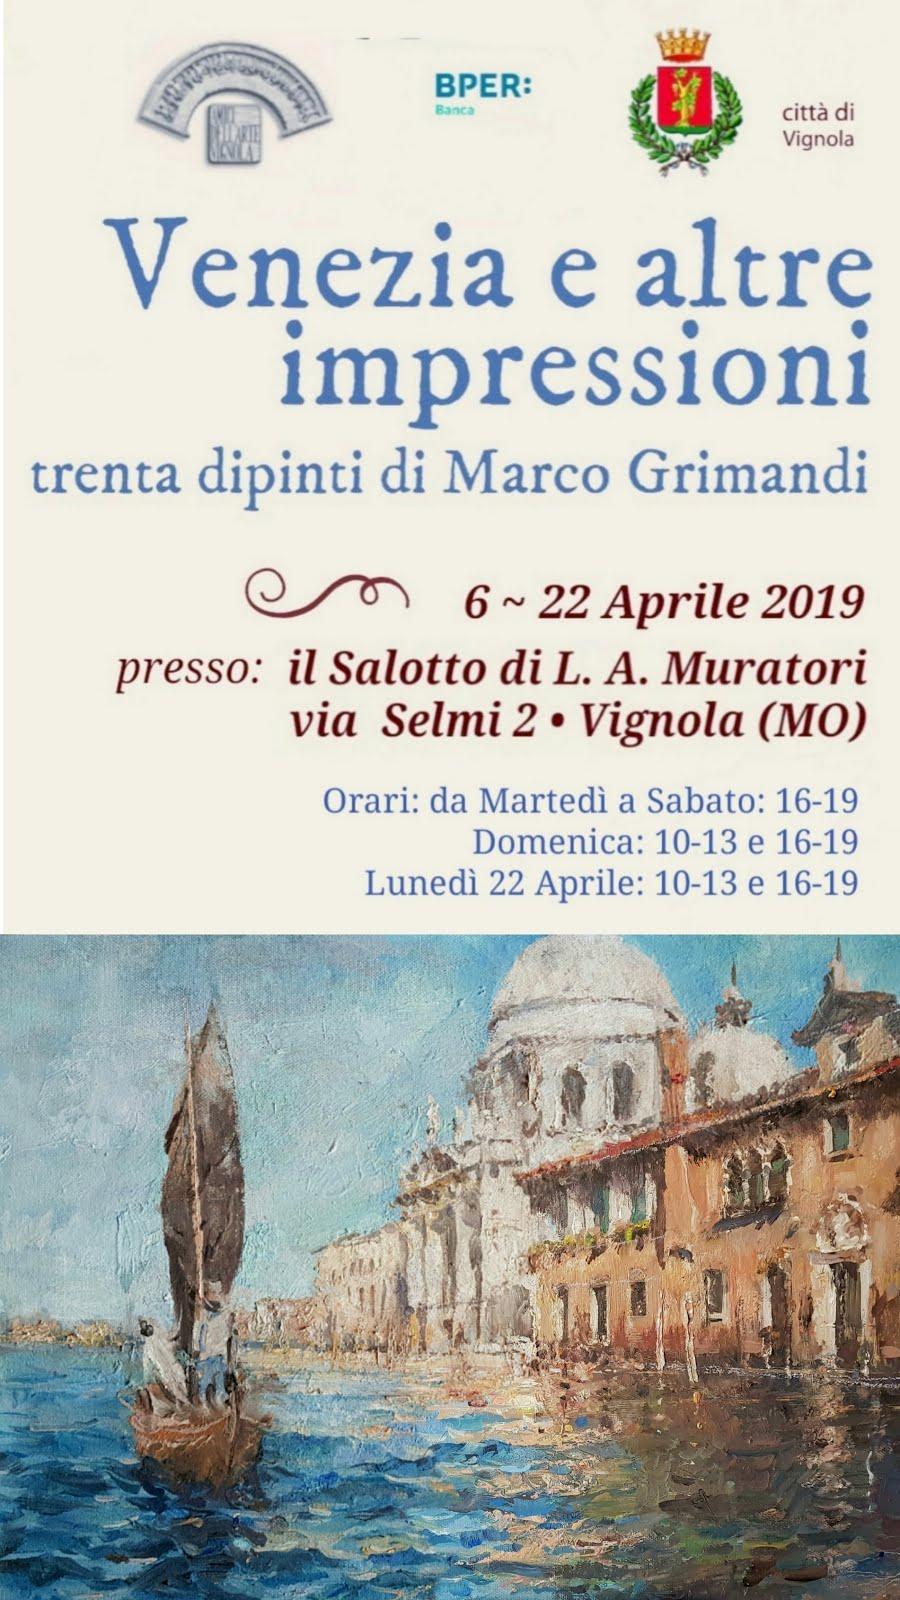 In mostra a Vignola, Aprile scorso